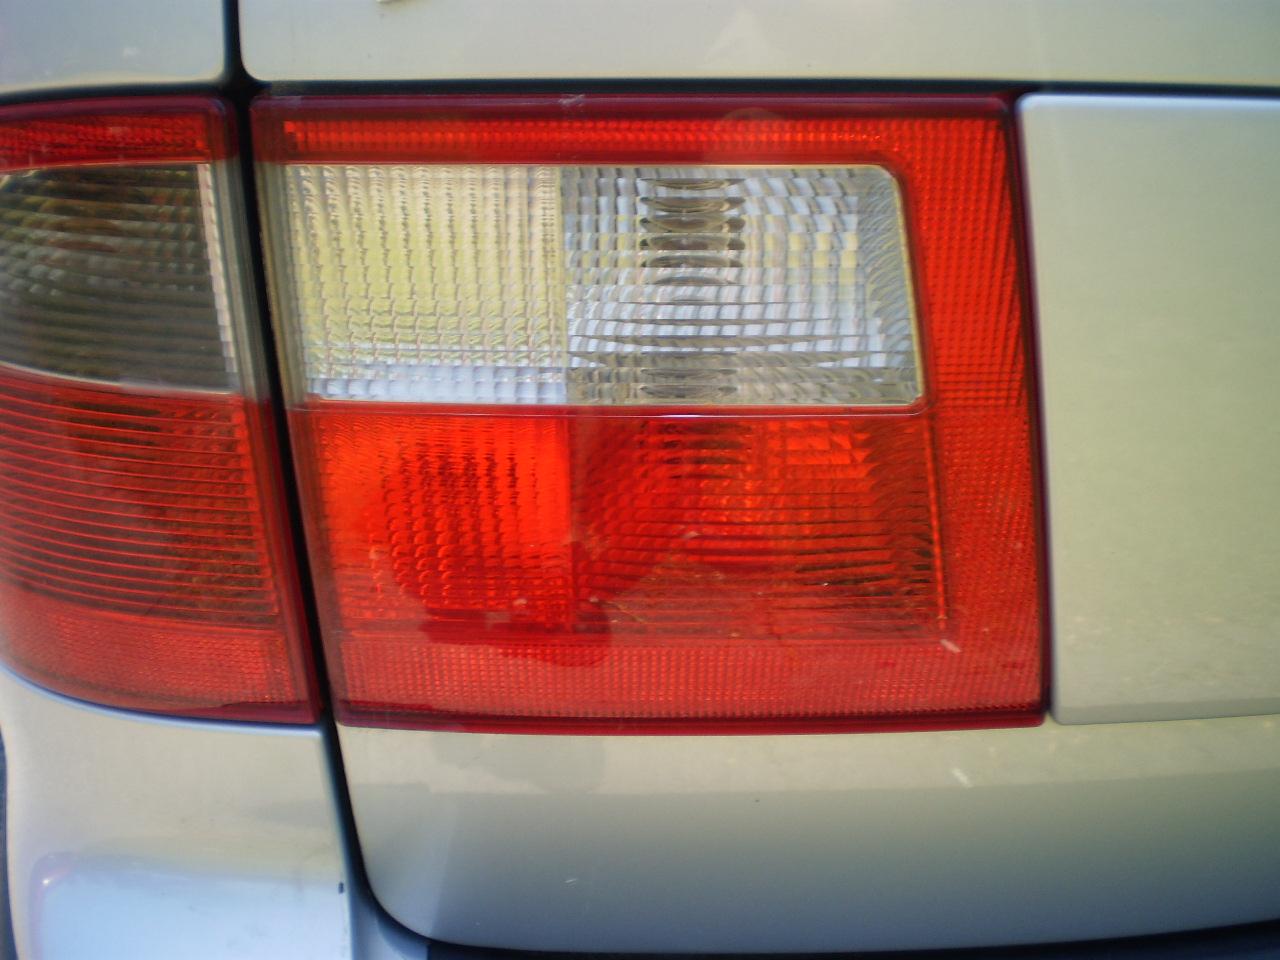 Driver Side Trunk Light 2003 SAAB 9-5 Wagon